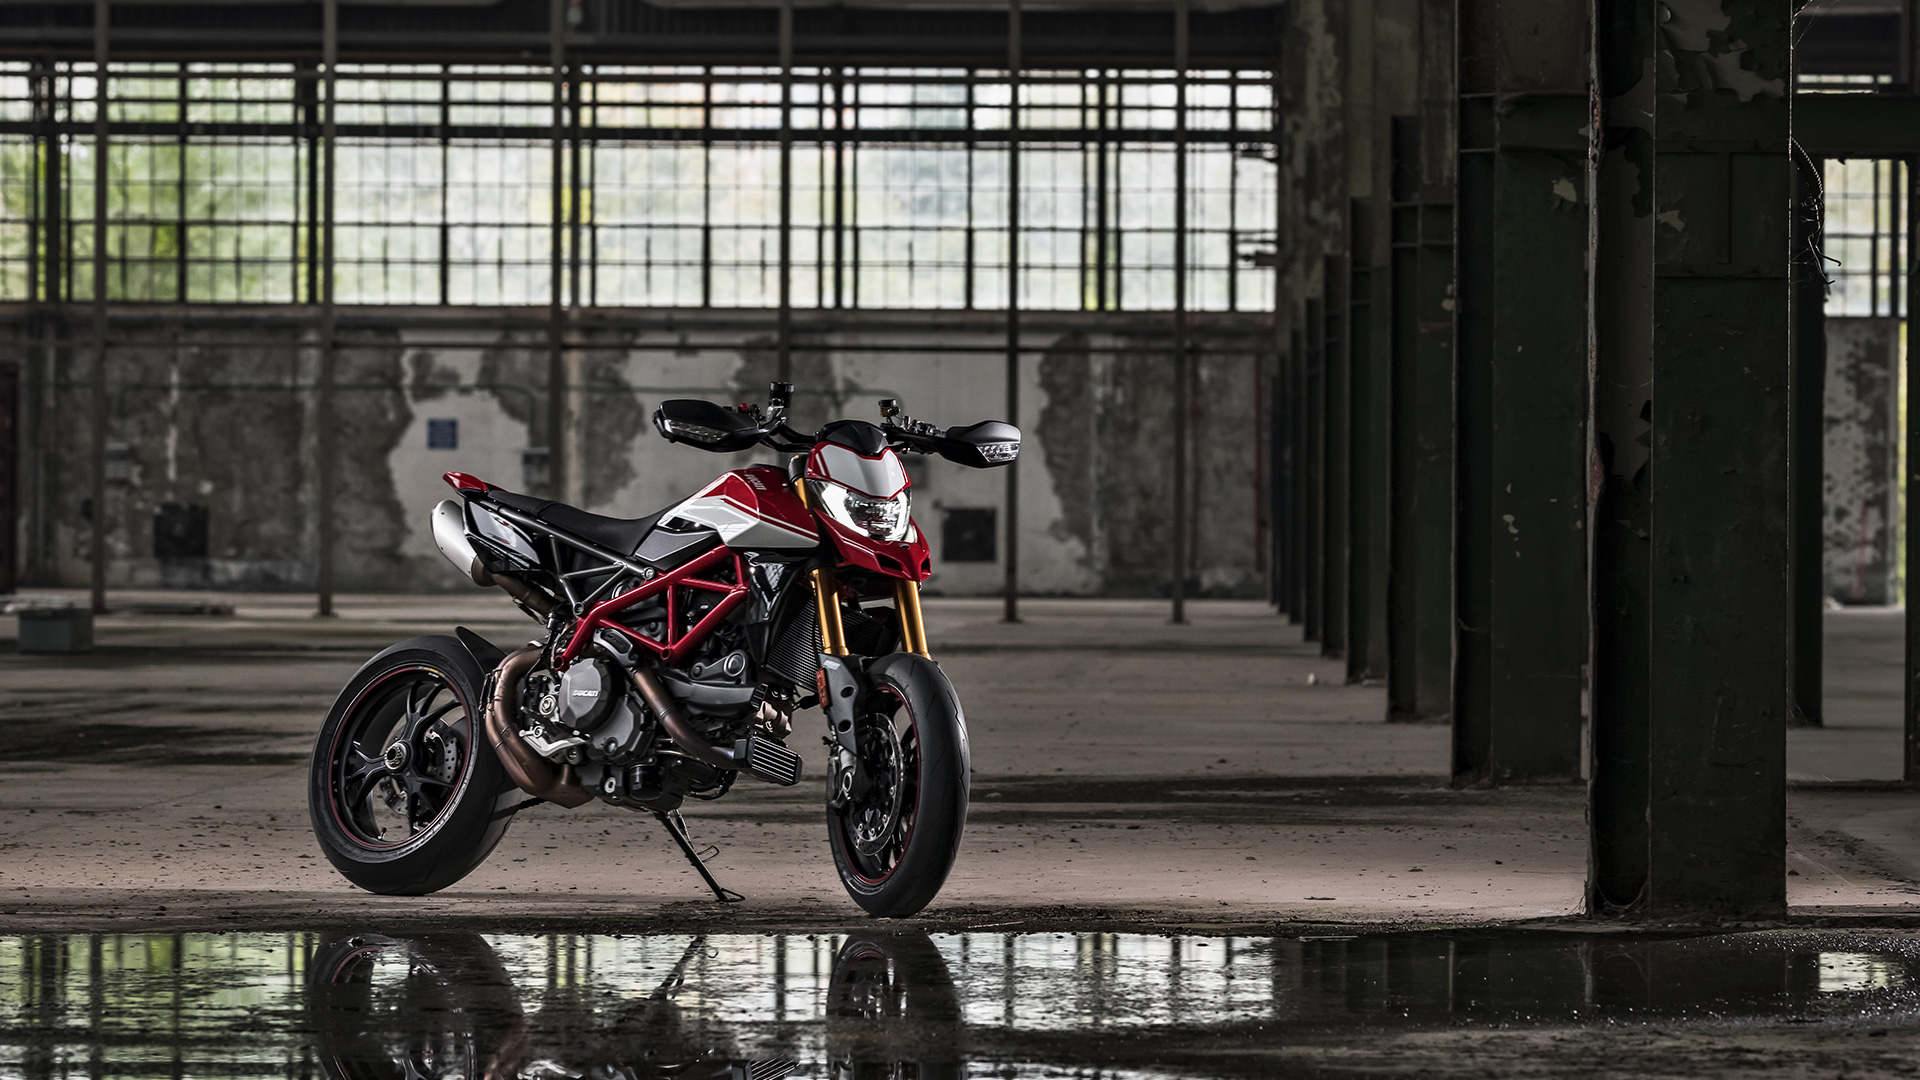 New Ducati Hypermotard 950 Pure Fun Endless Adrenalin